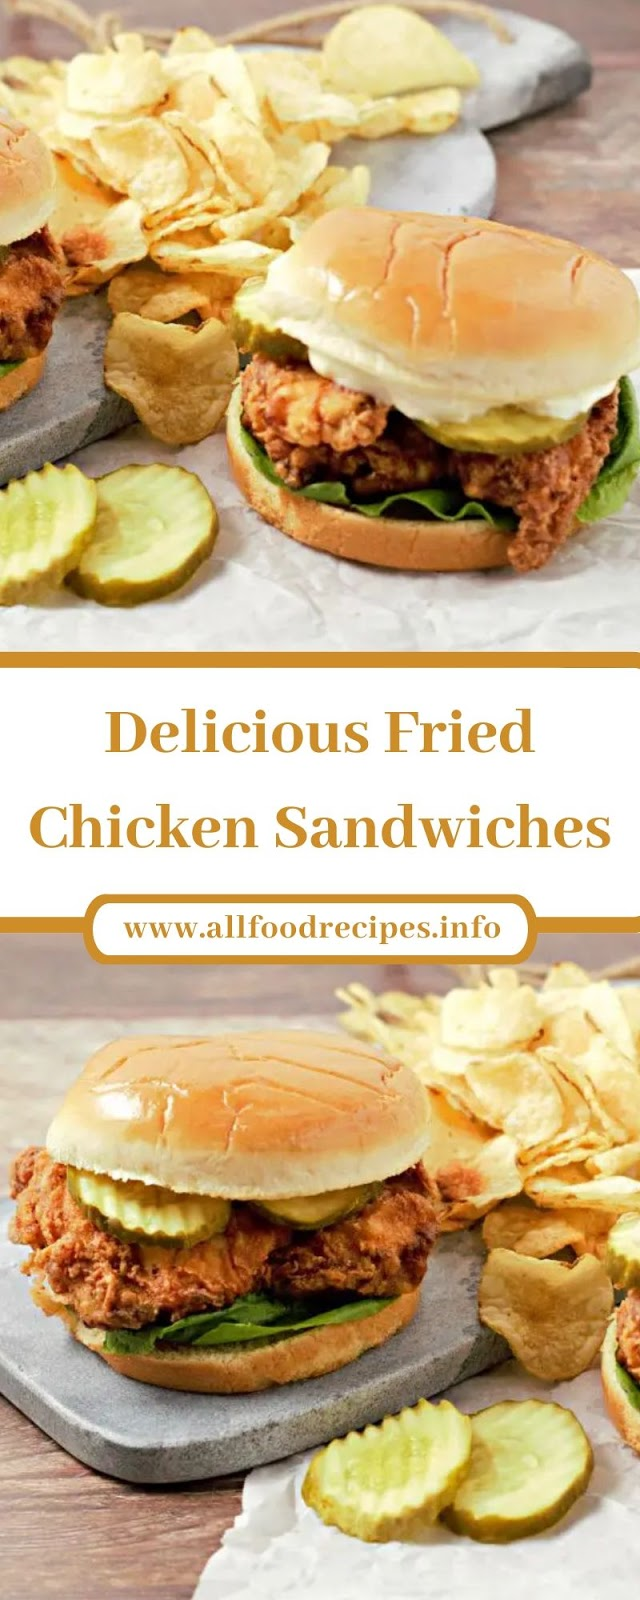 Delicious Fried Chicken Sandwiches